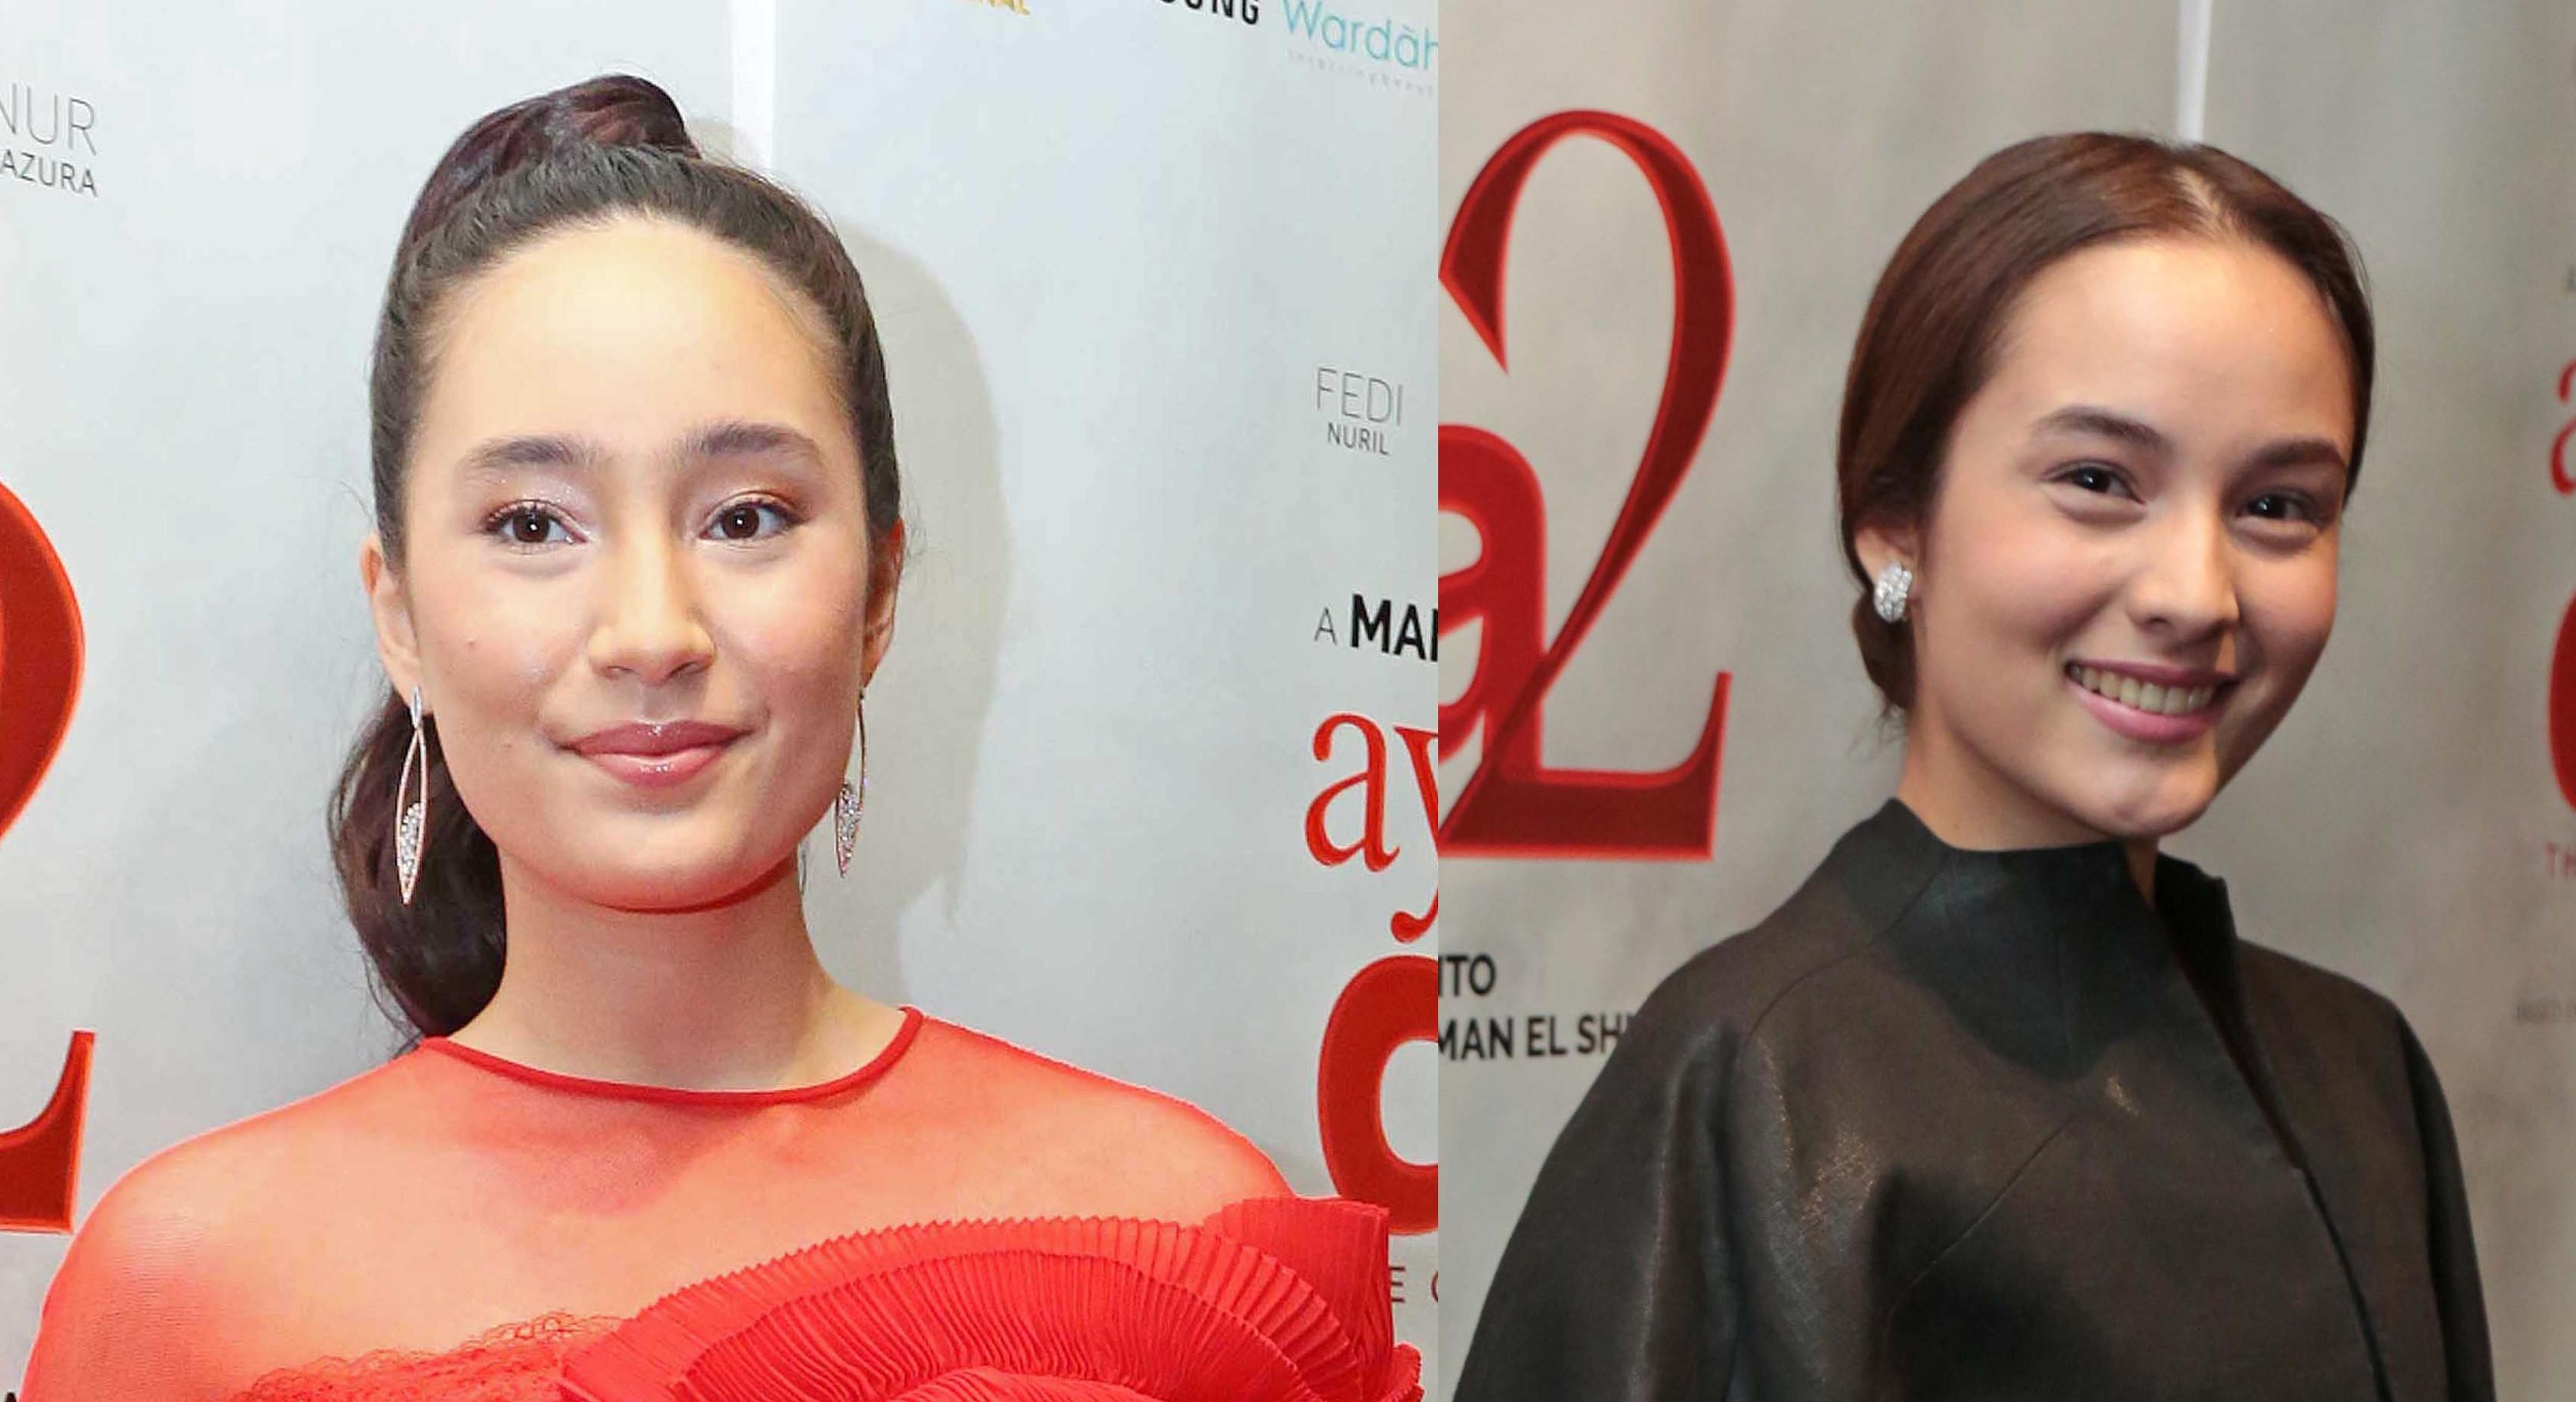 Akting Bareng 2 Aktris Cantik Ini Yang Dirasakan Fedi Nuril Showbiz Liputan6 Com